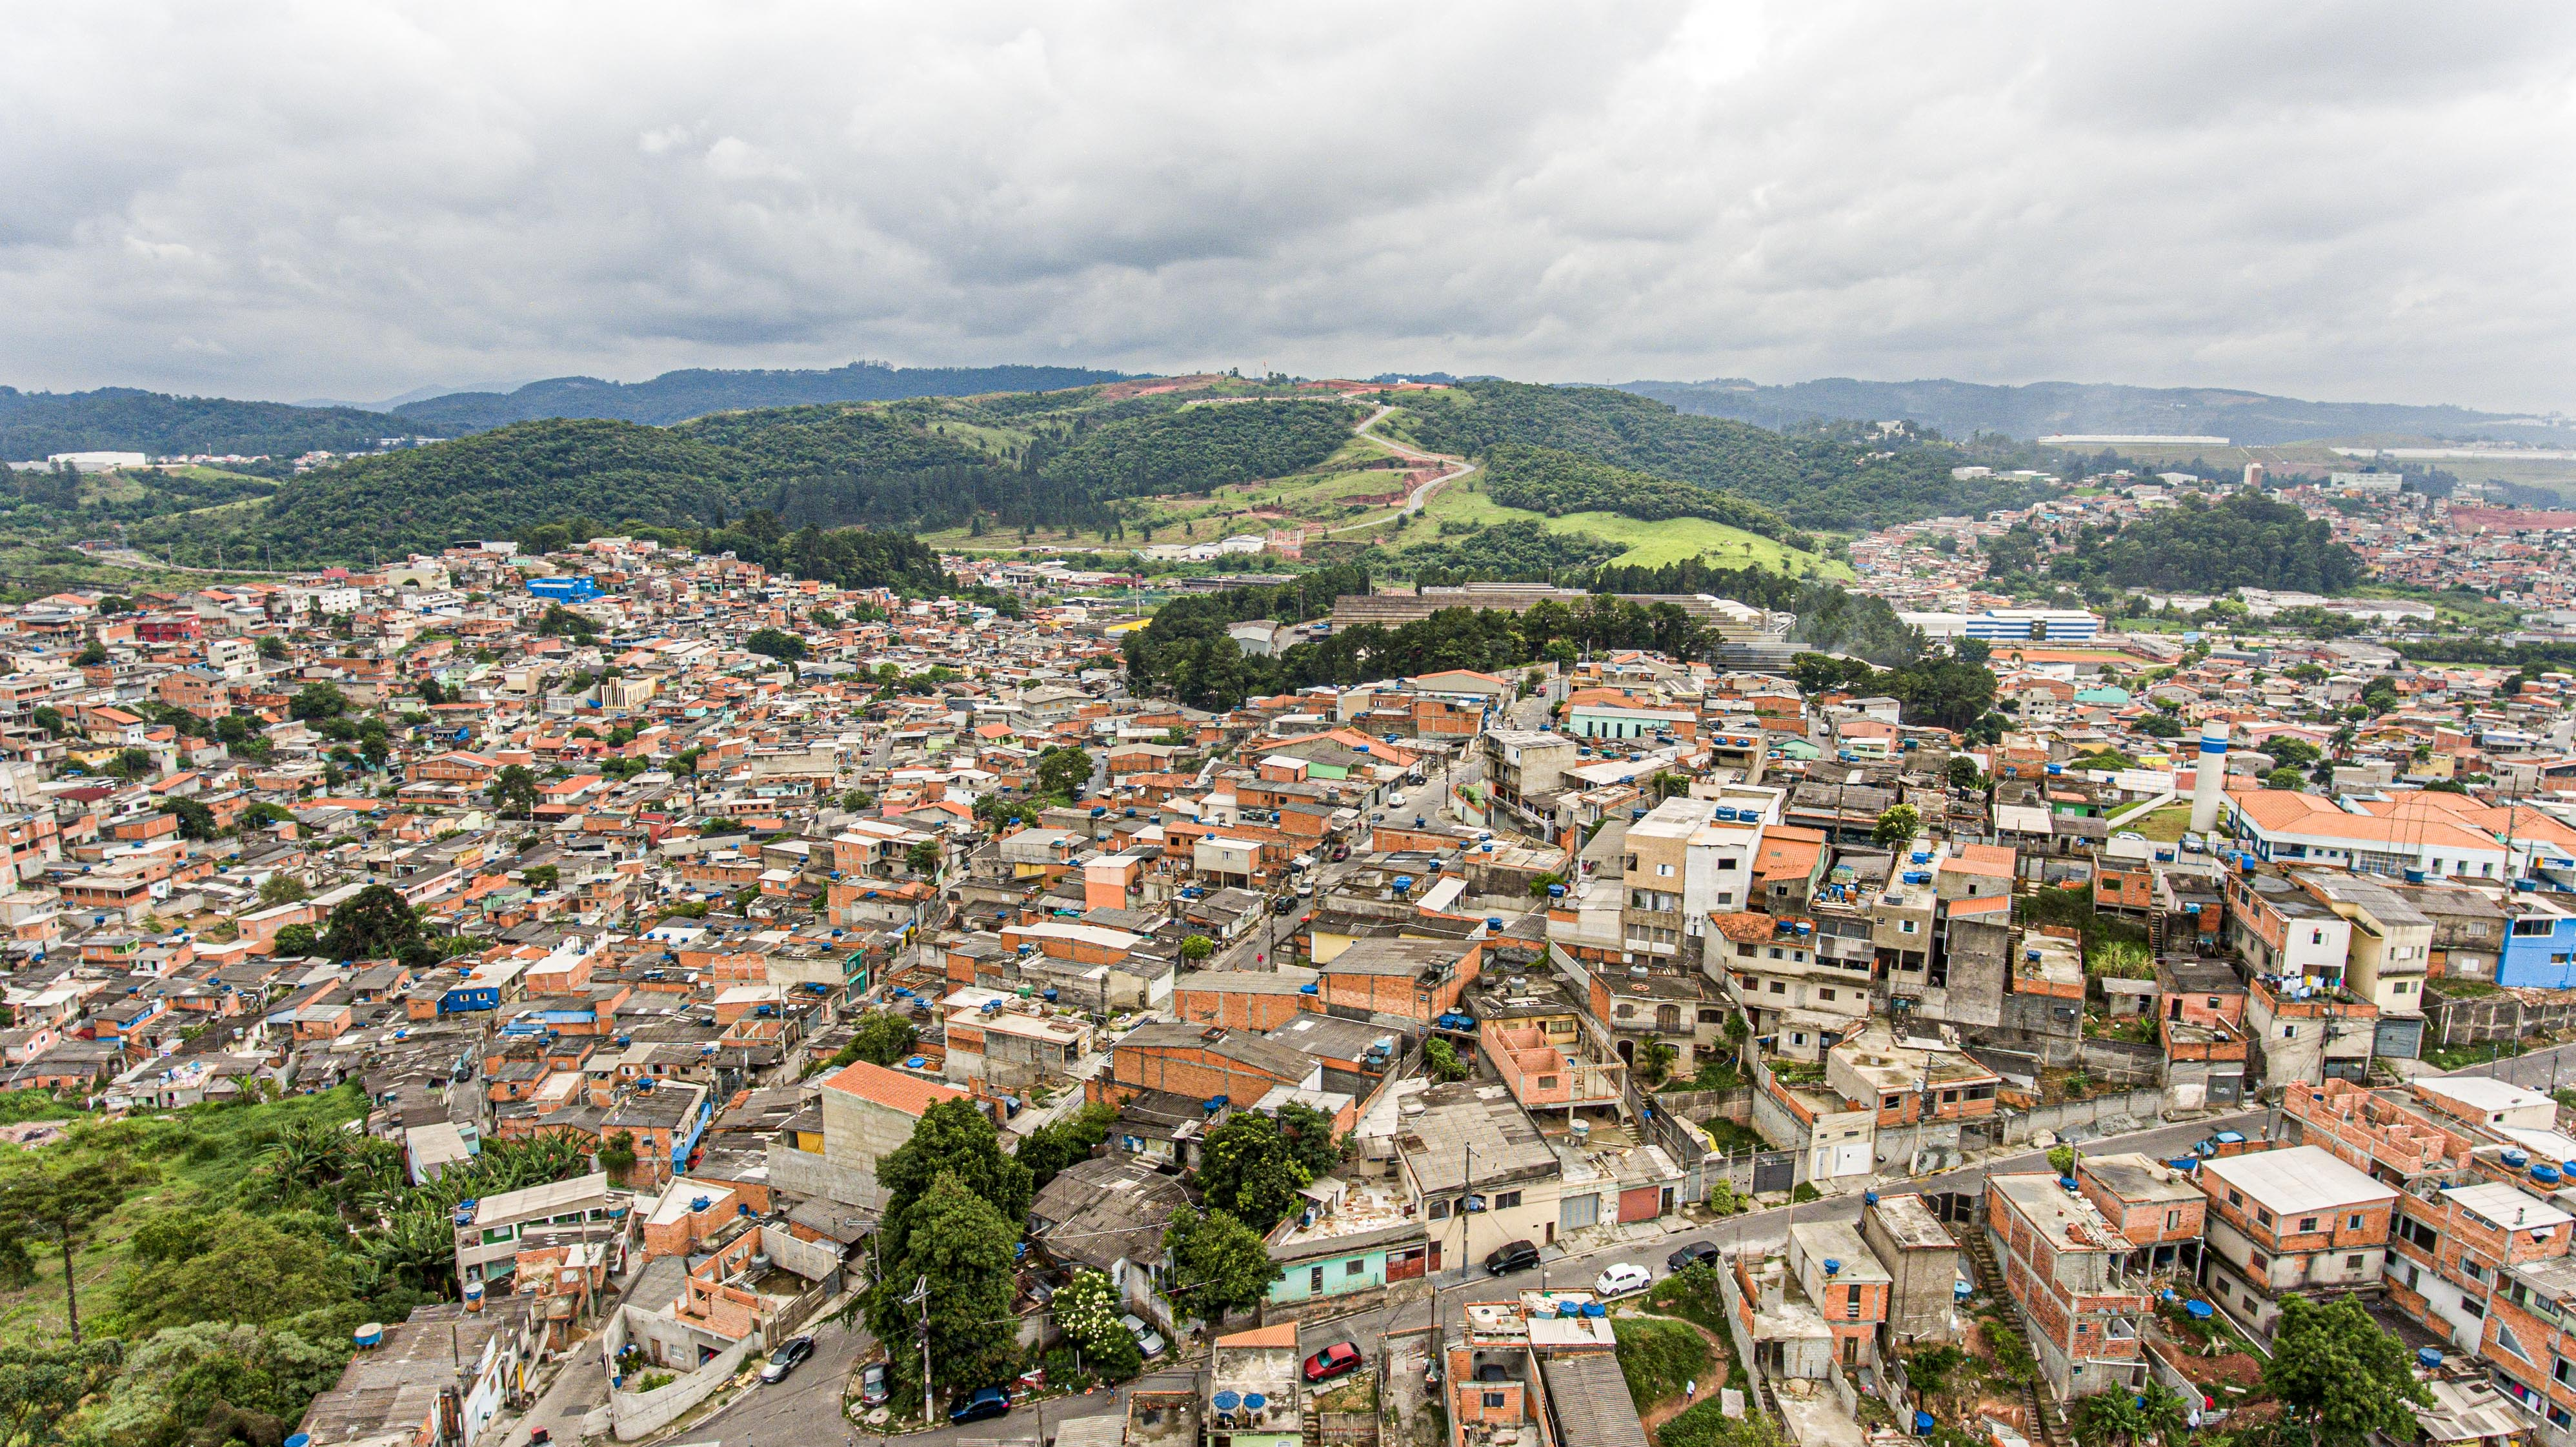 Fonte: noticias.itapevi.sp.gov.br